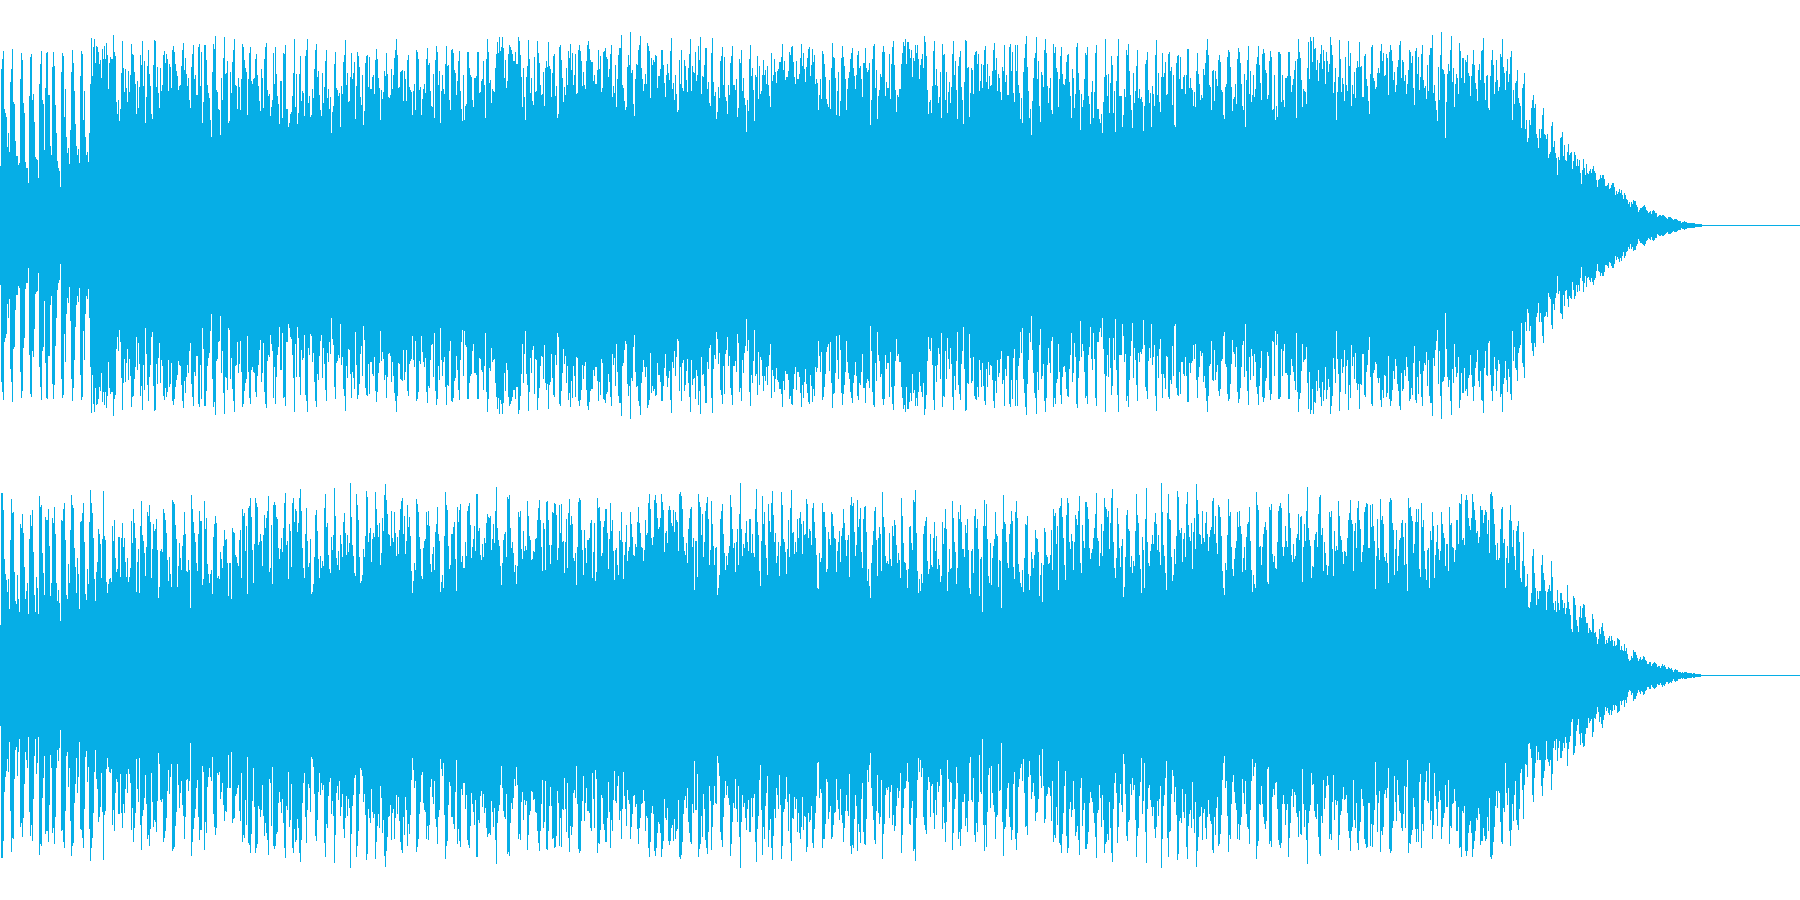 RPGの草原をイメージしたオーケストラの再生済みの波形